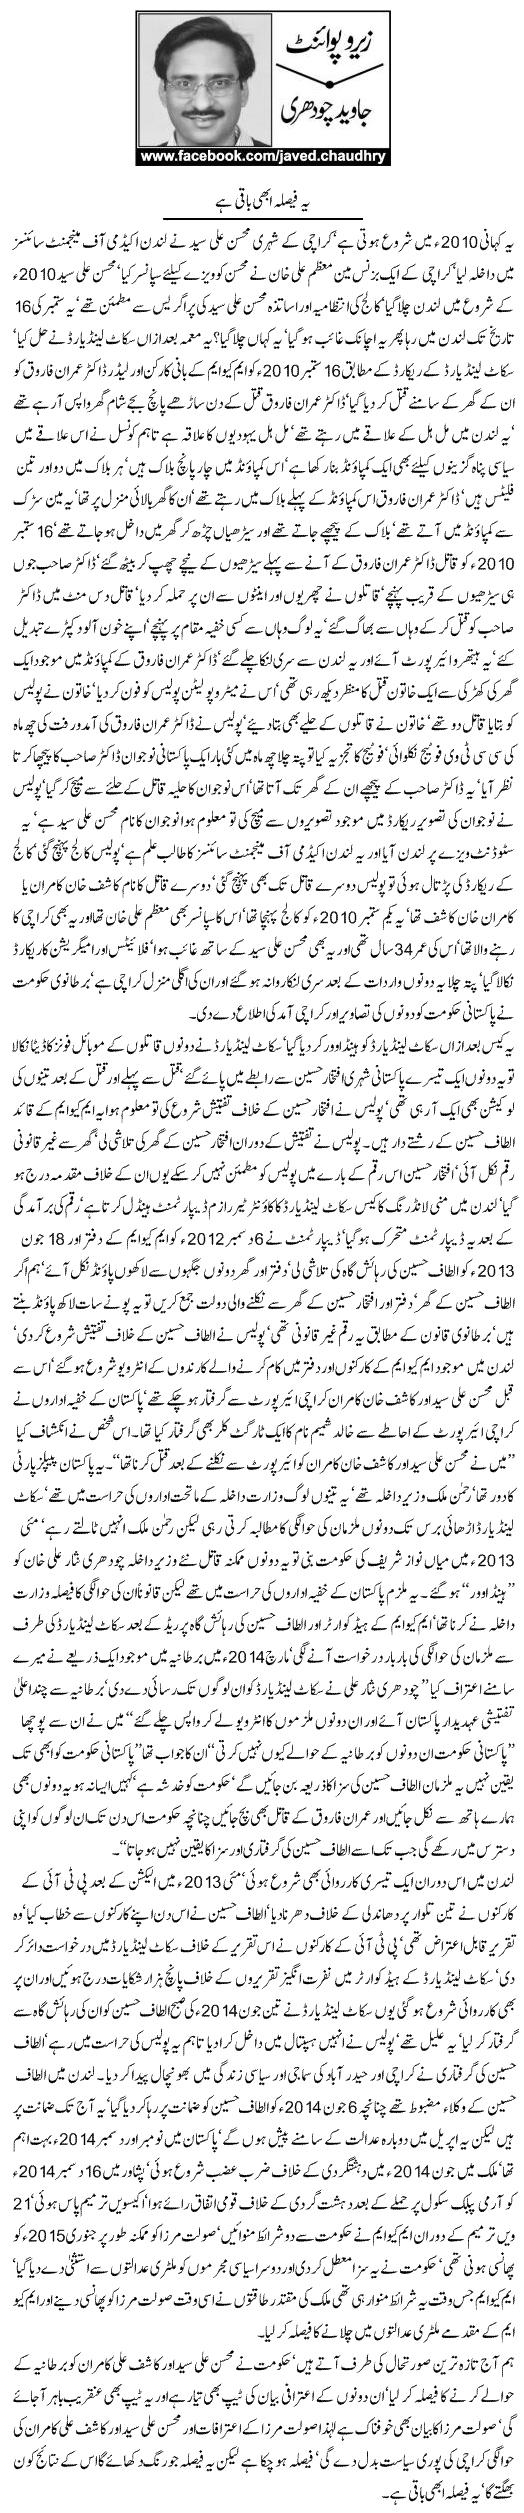 Yeh Faisla Abhi Baqi Hai By Javed Chaudhry - Pakfunny